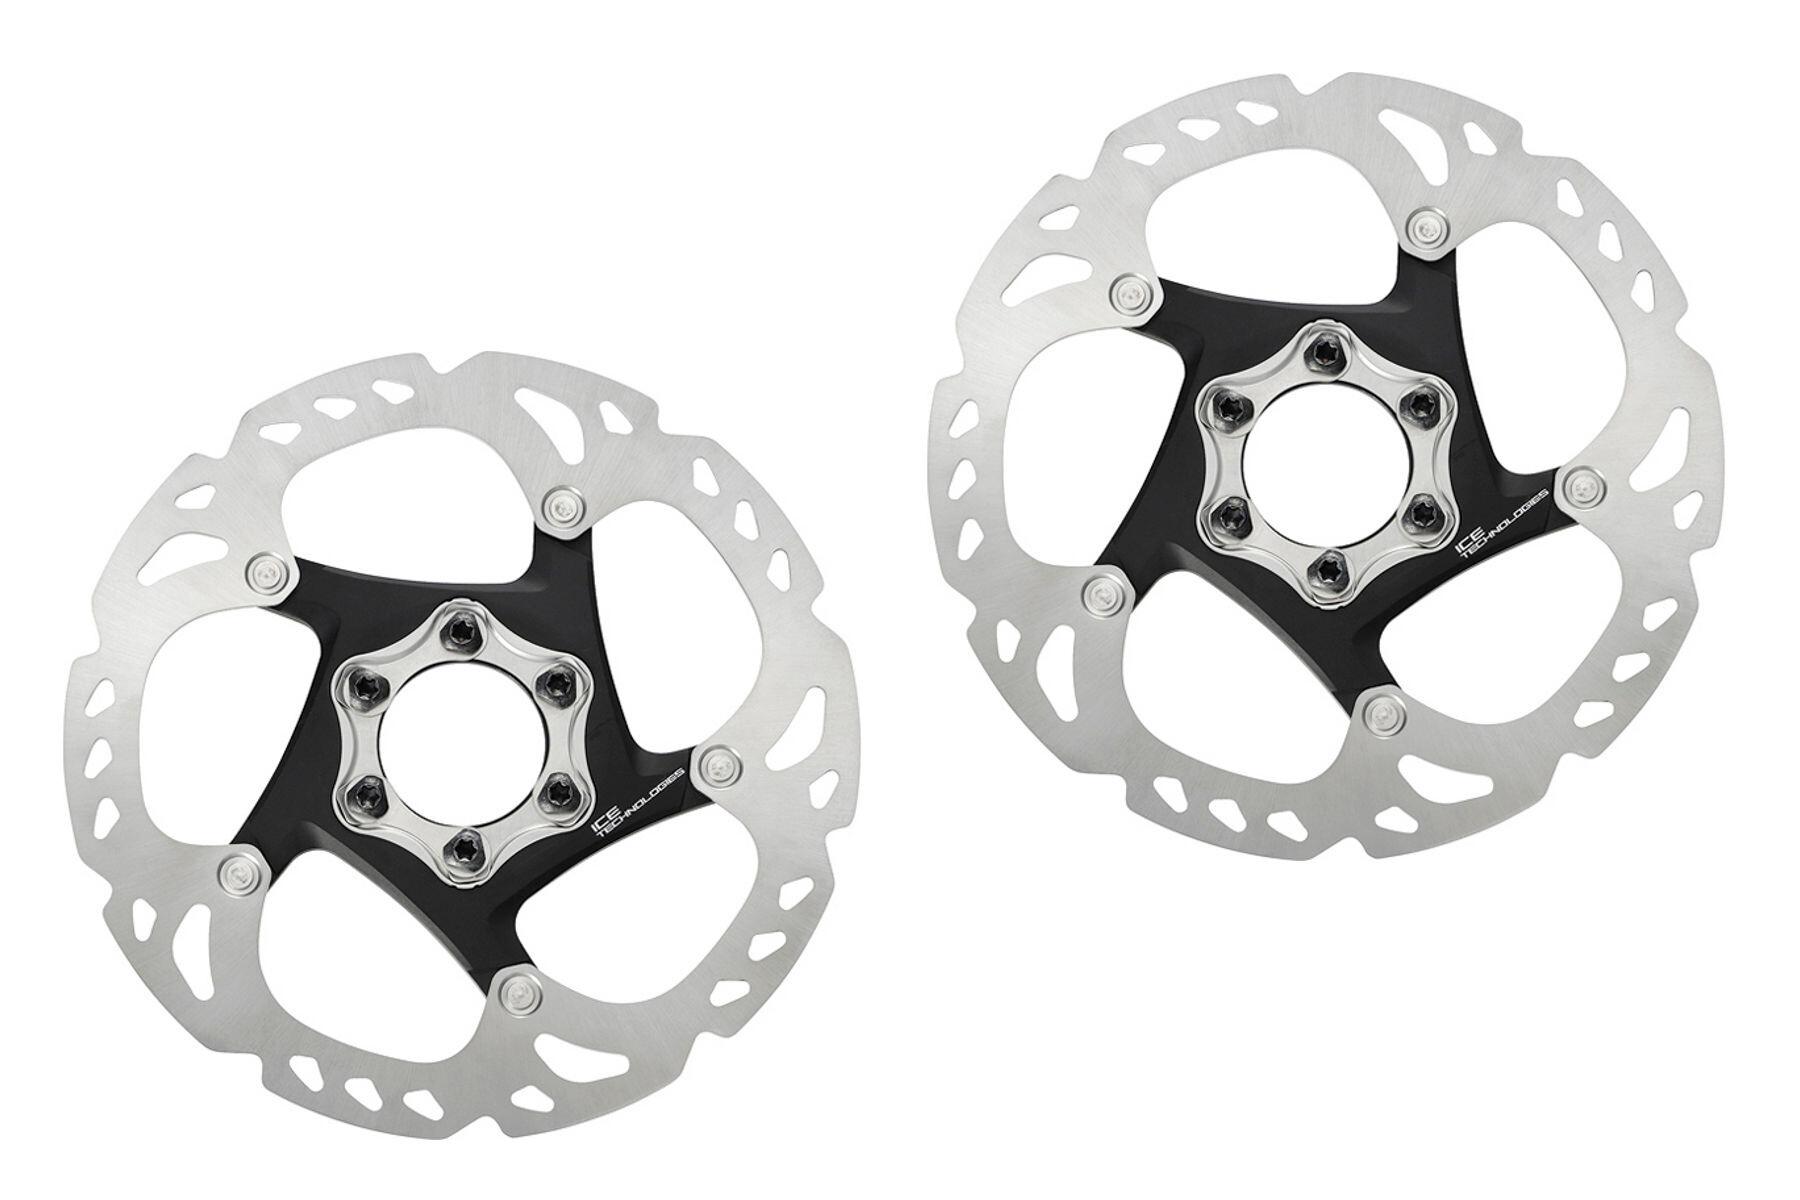 Shimano Deore XT SM-RT86 Bremseskiver ICE-Tech, 2er sæt, silver (2019) | Brake pads